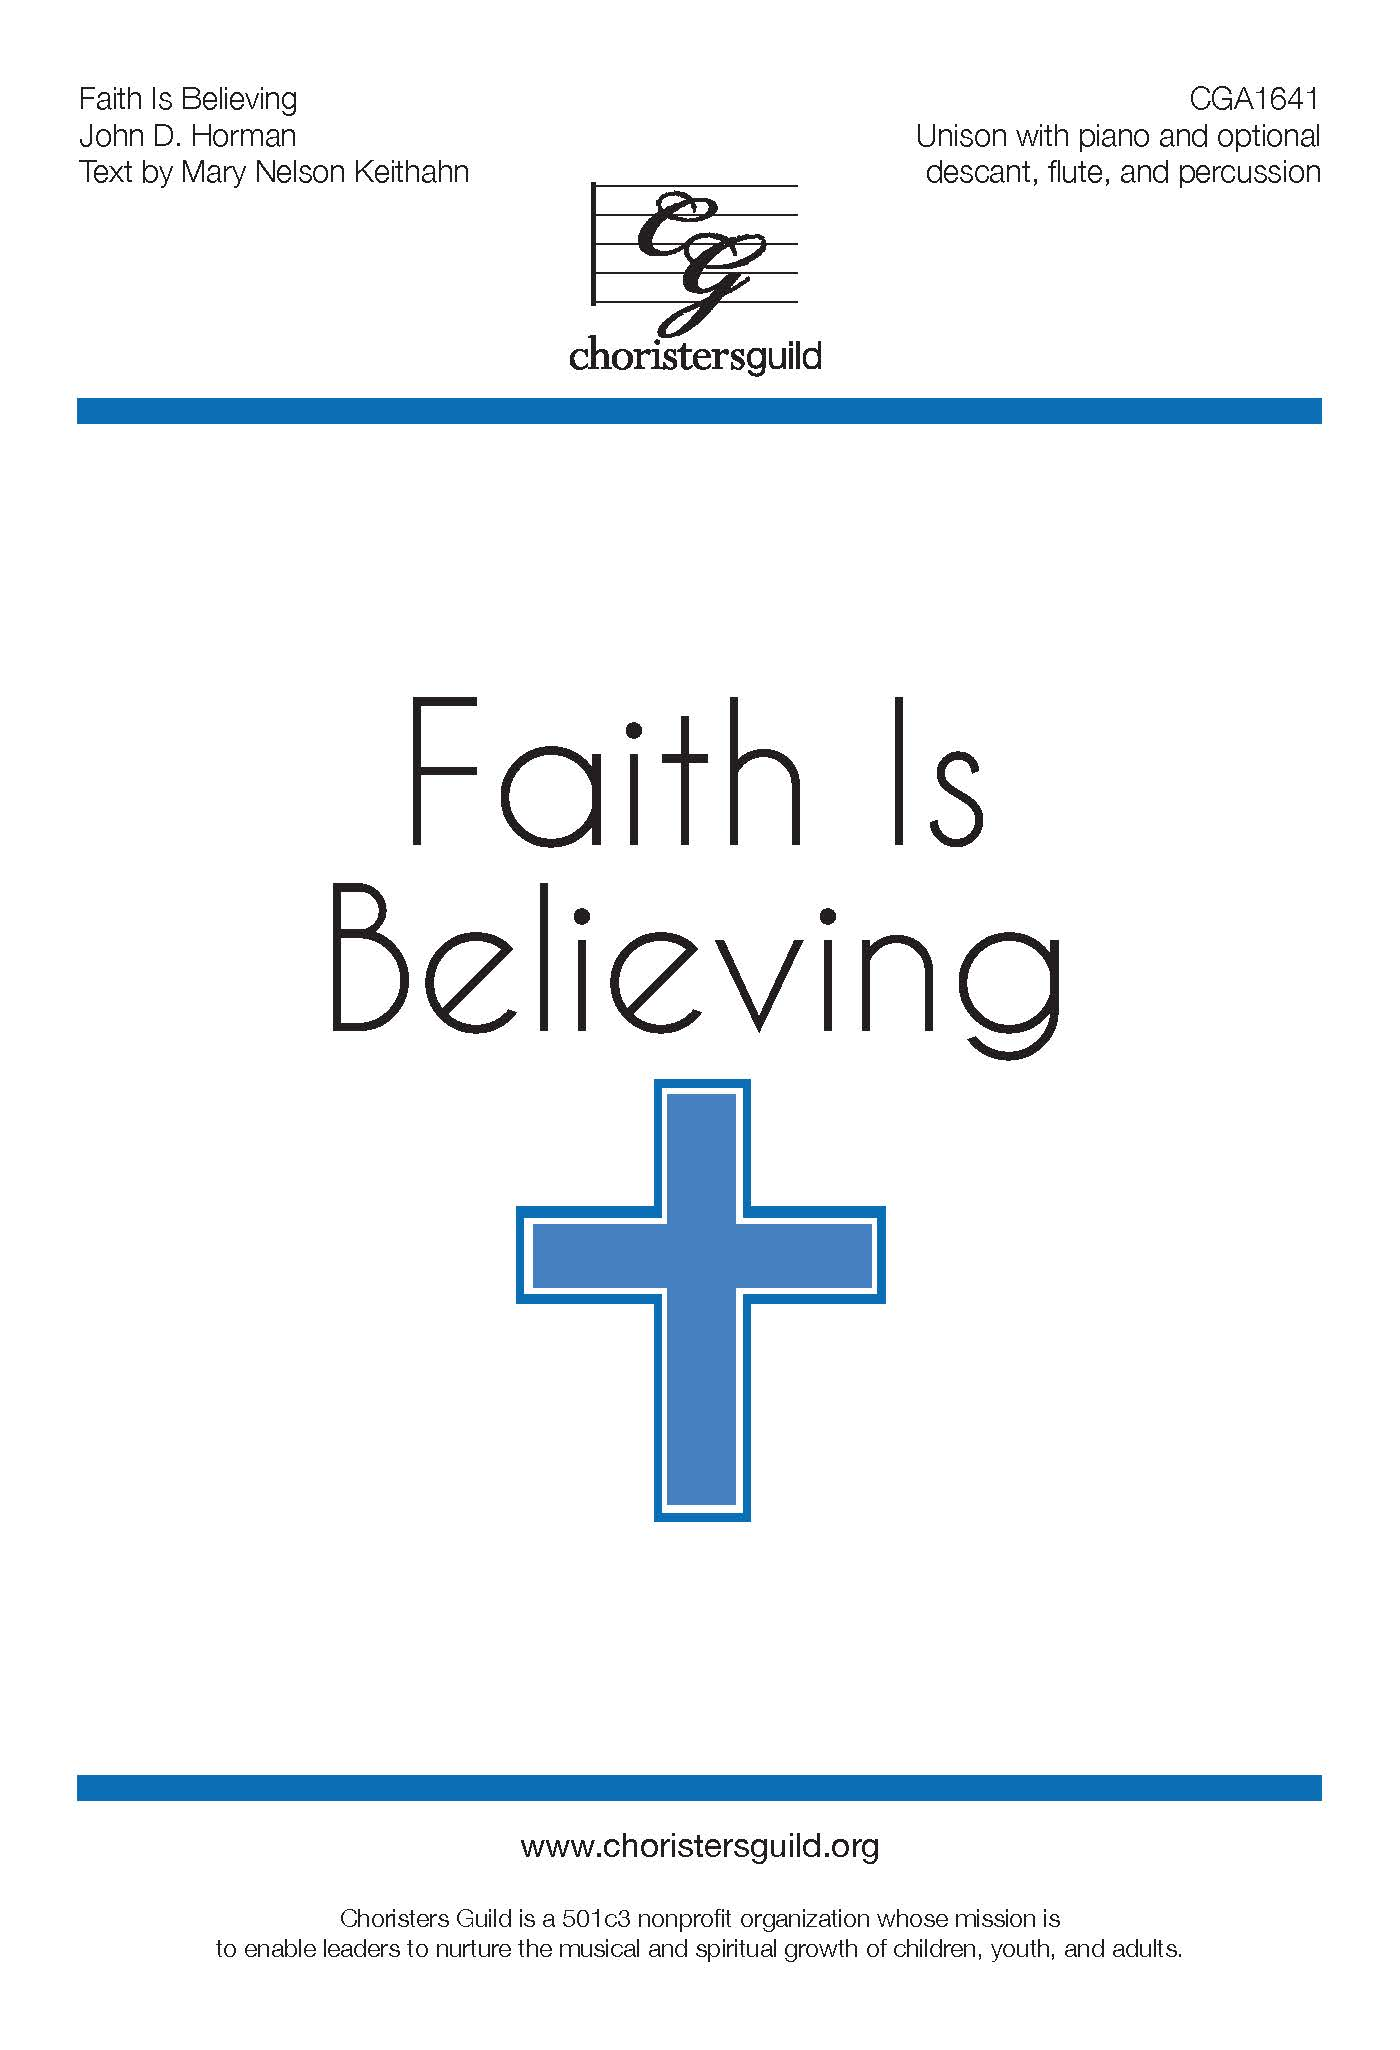 Faith is Believing - Unison